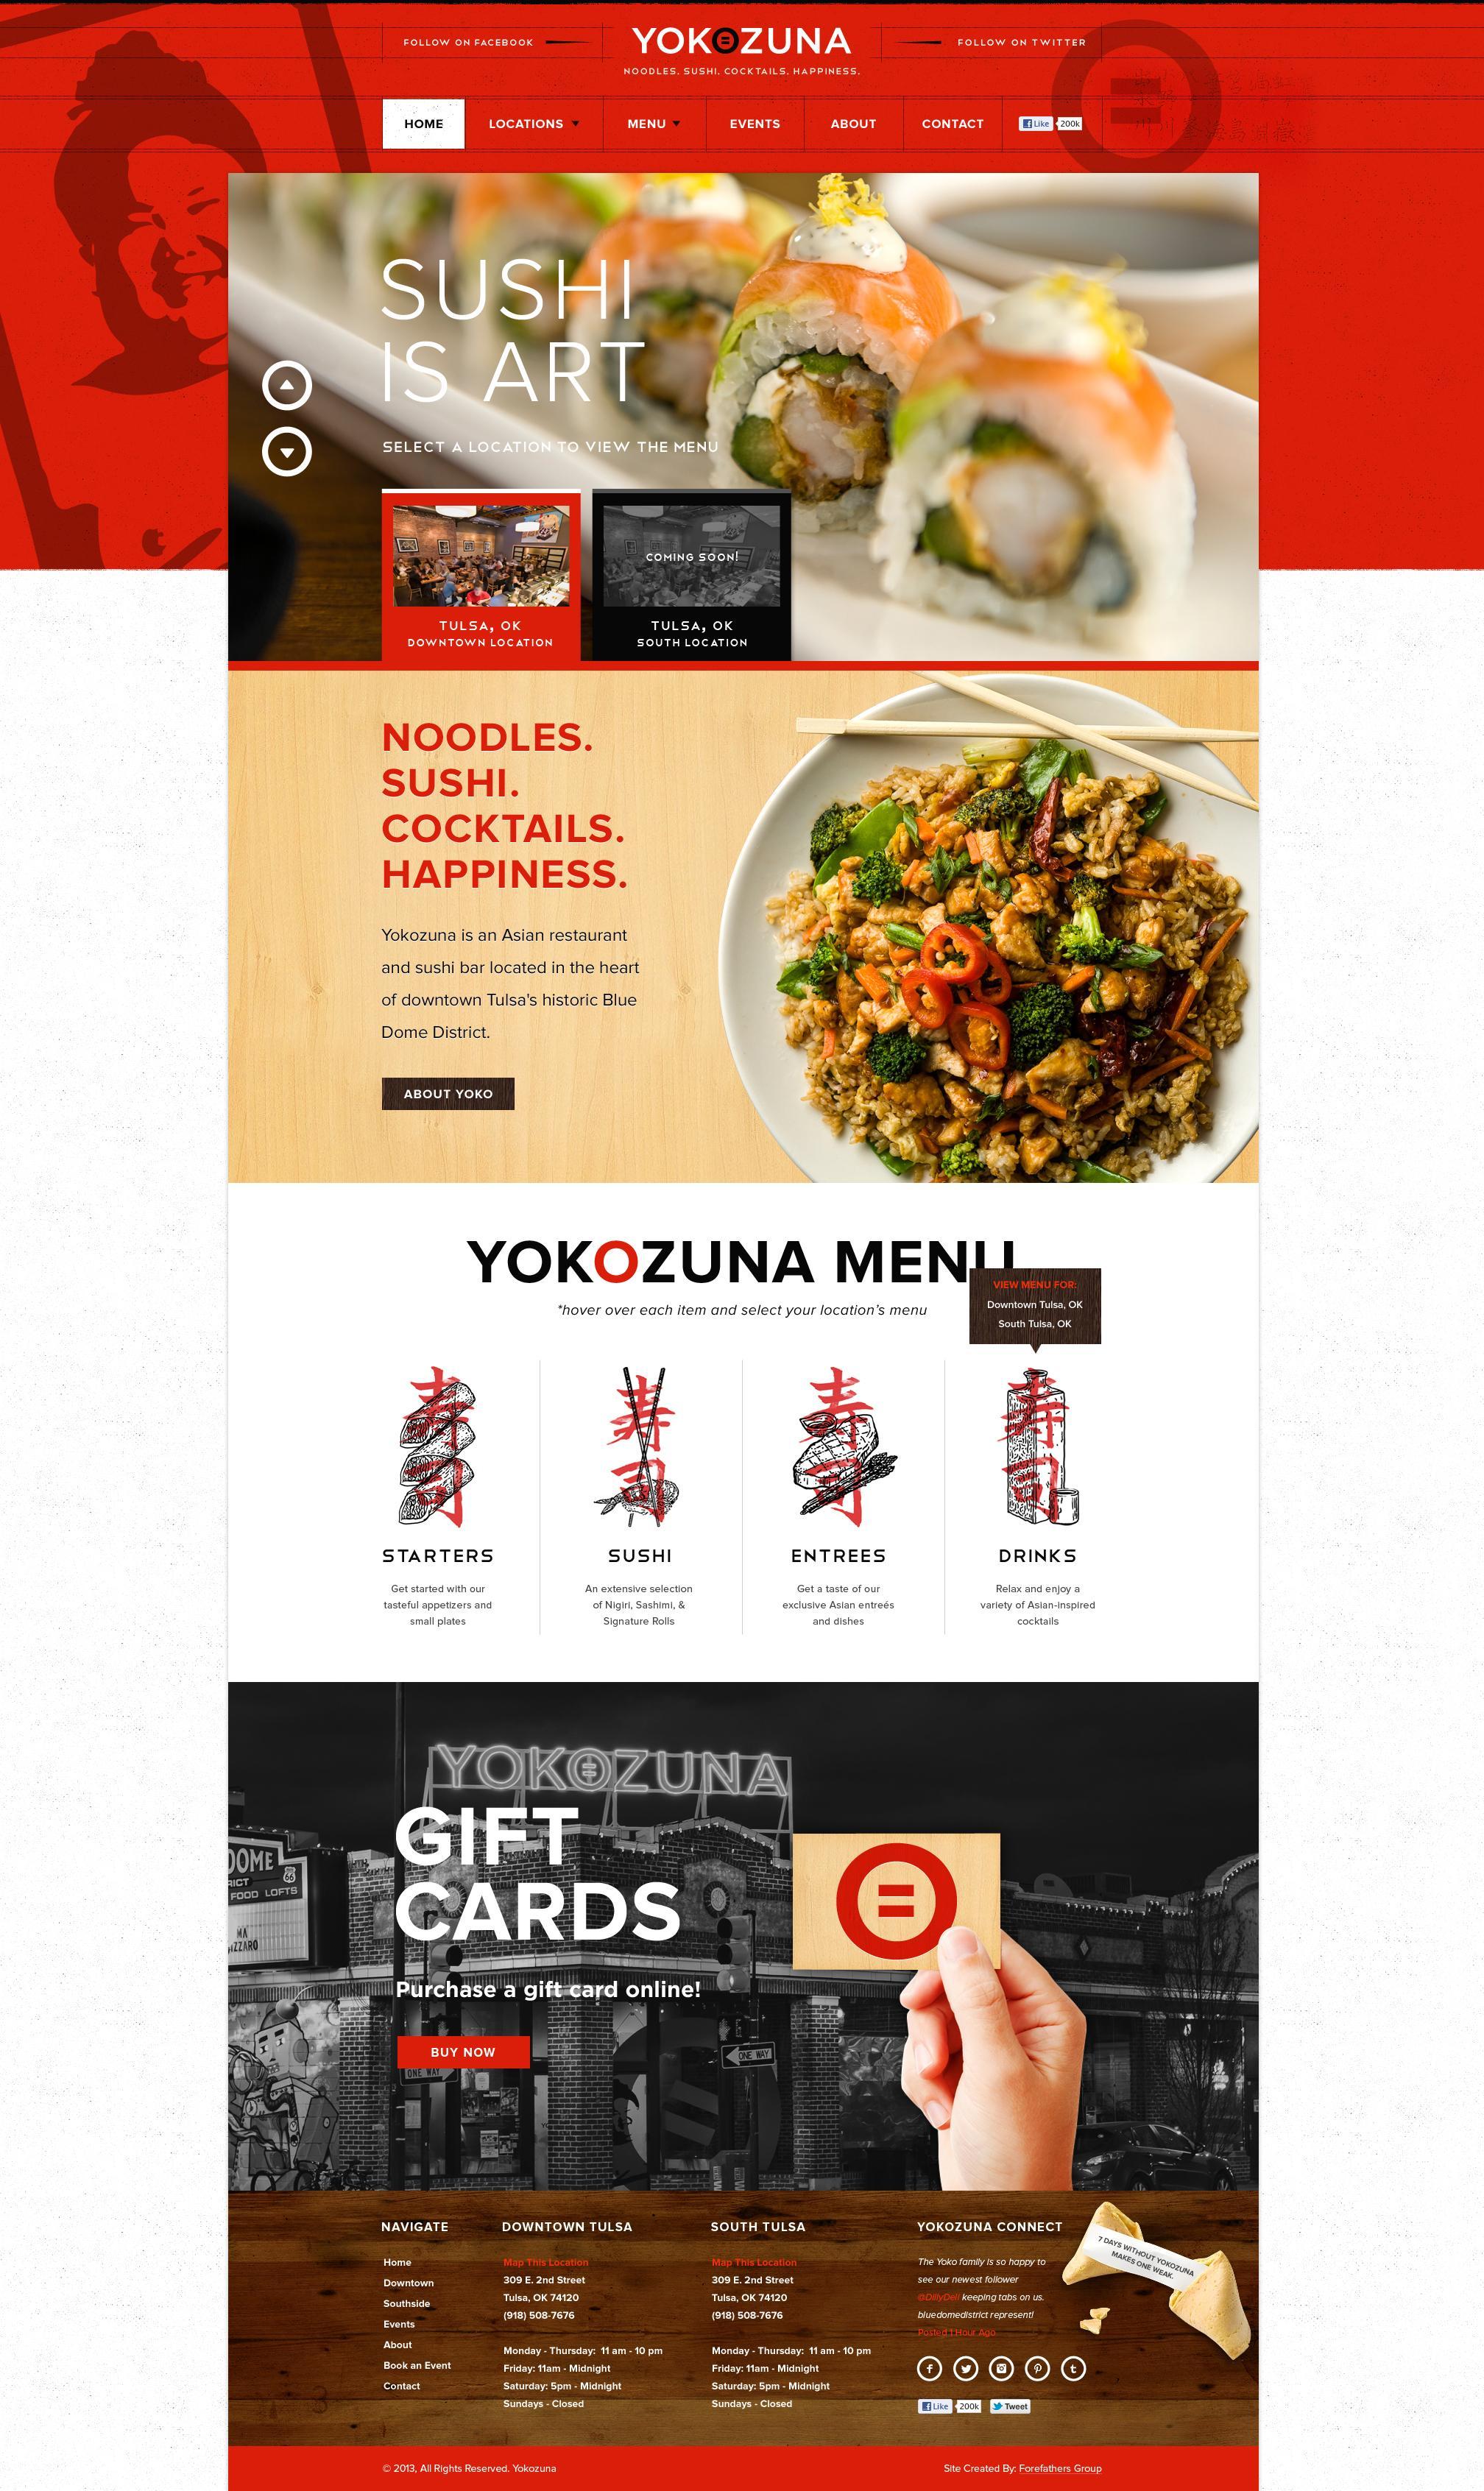 yokozuna.jpg by Forefathers™